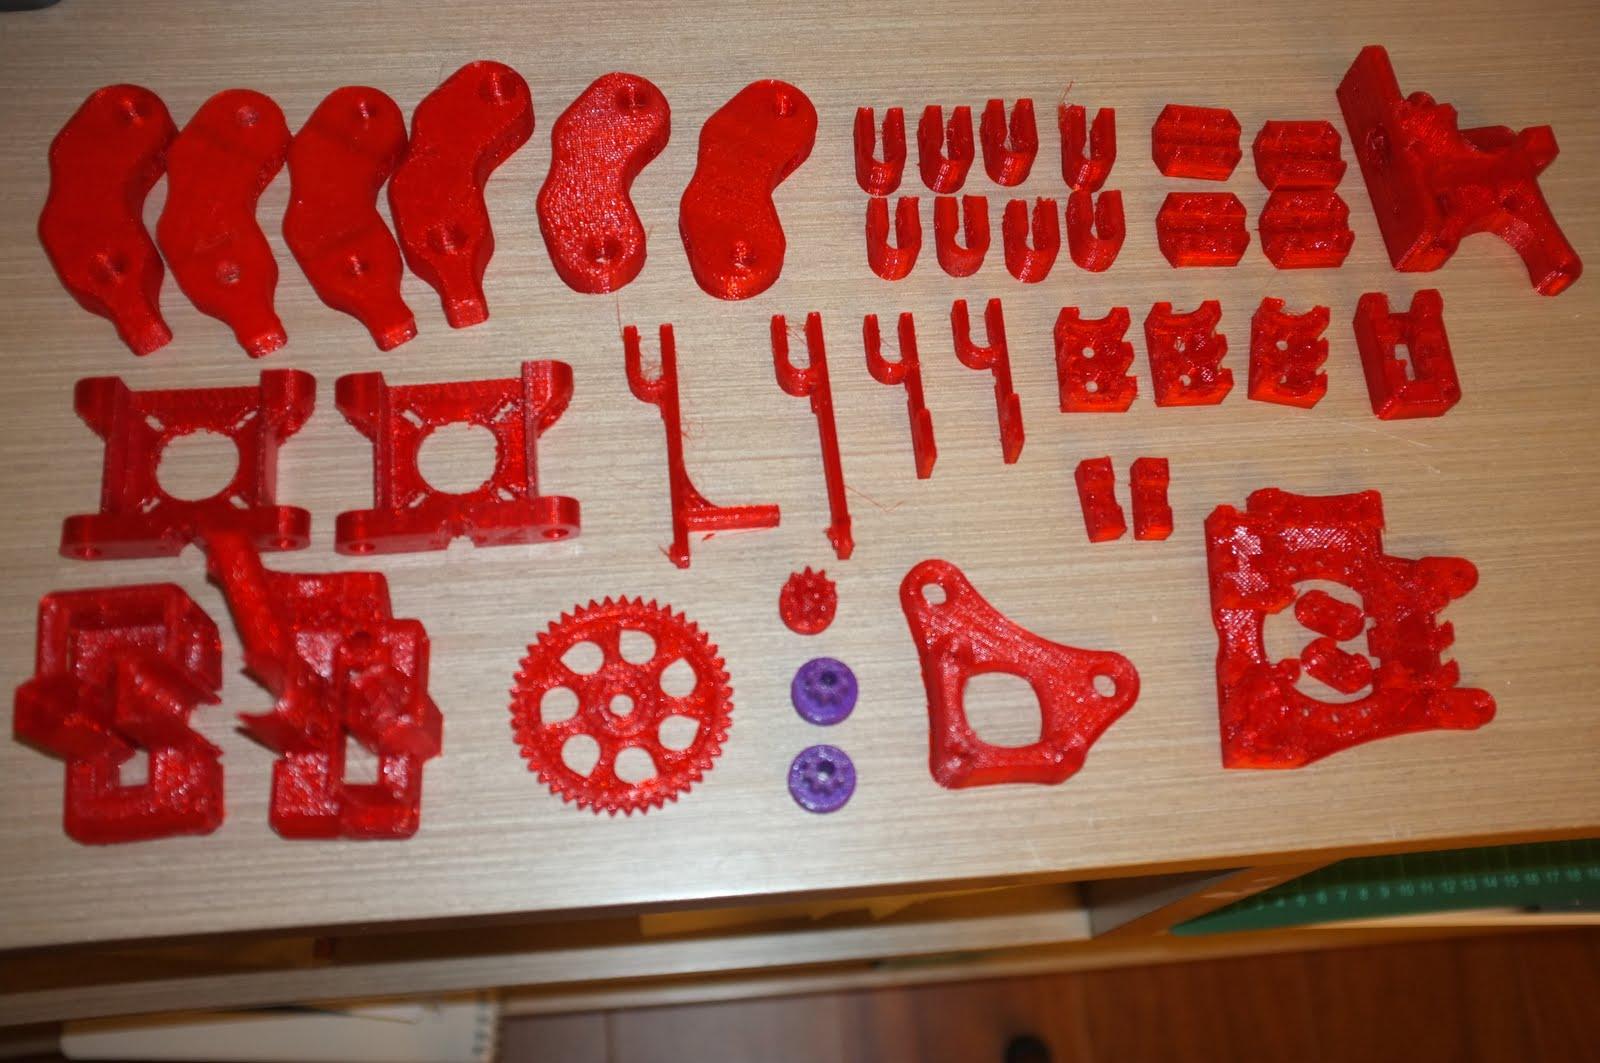 Http 000vmms3amazonawscom Printrbot Files 2011 08 Super Speed Circuit 5m Race Set Amazoncouk Toys Games Dscf3418